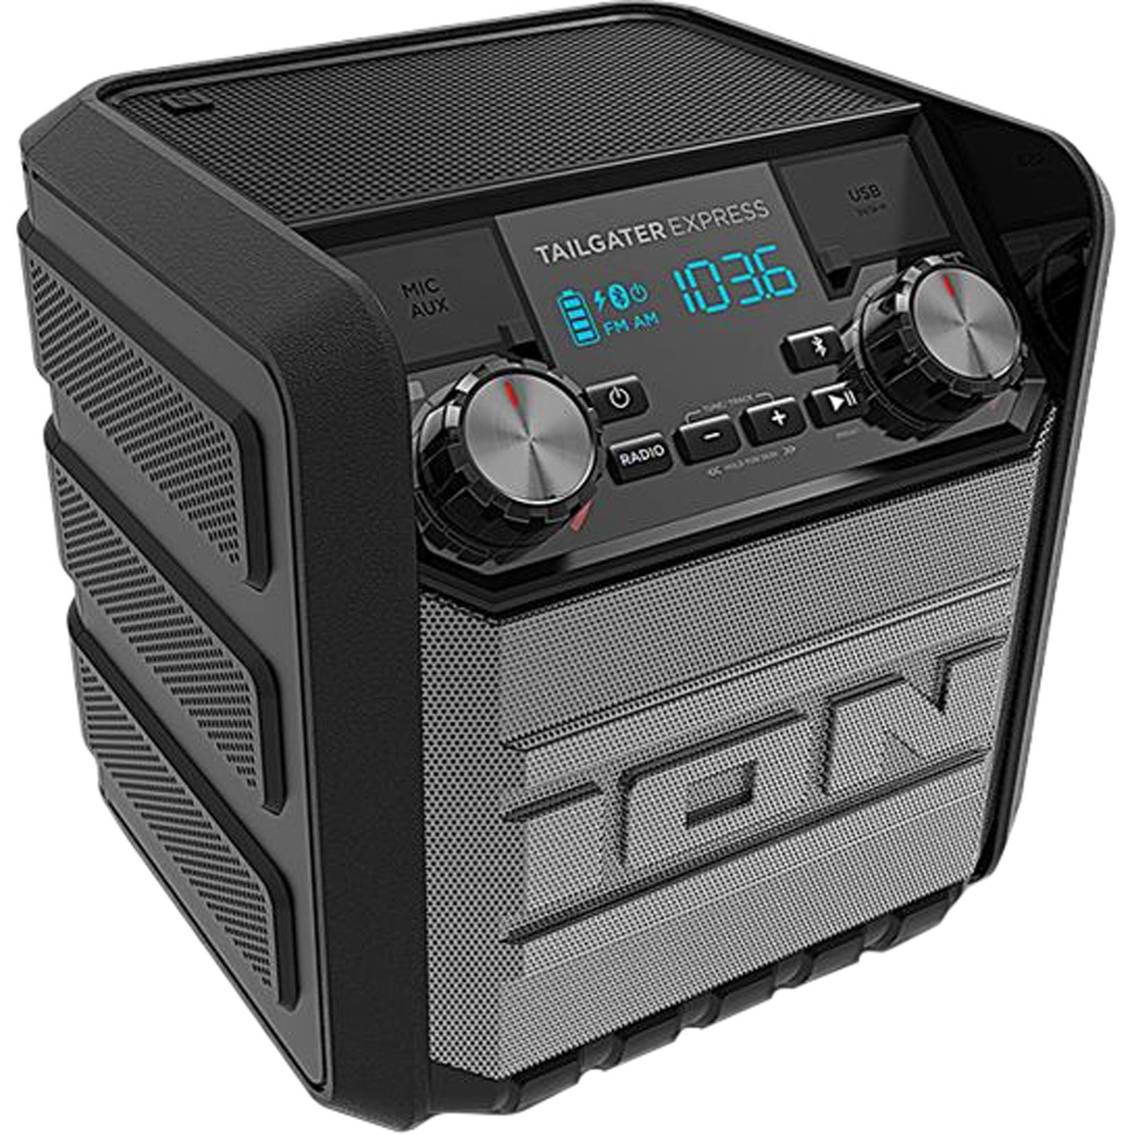 ion audio tailgater express portable speakers electronics shop rh shopmyexchange com ion tailgater bluetooth manual ion tailgater owners manual